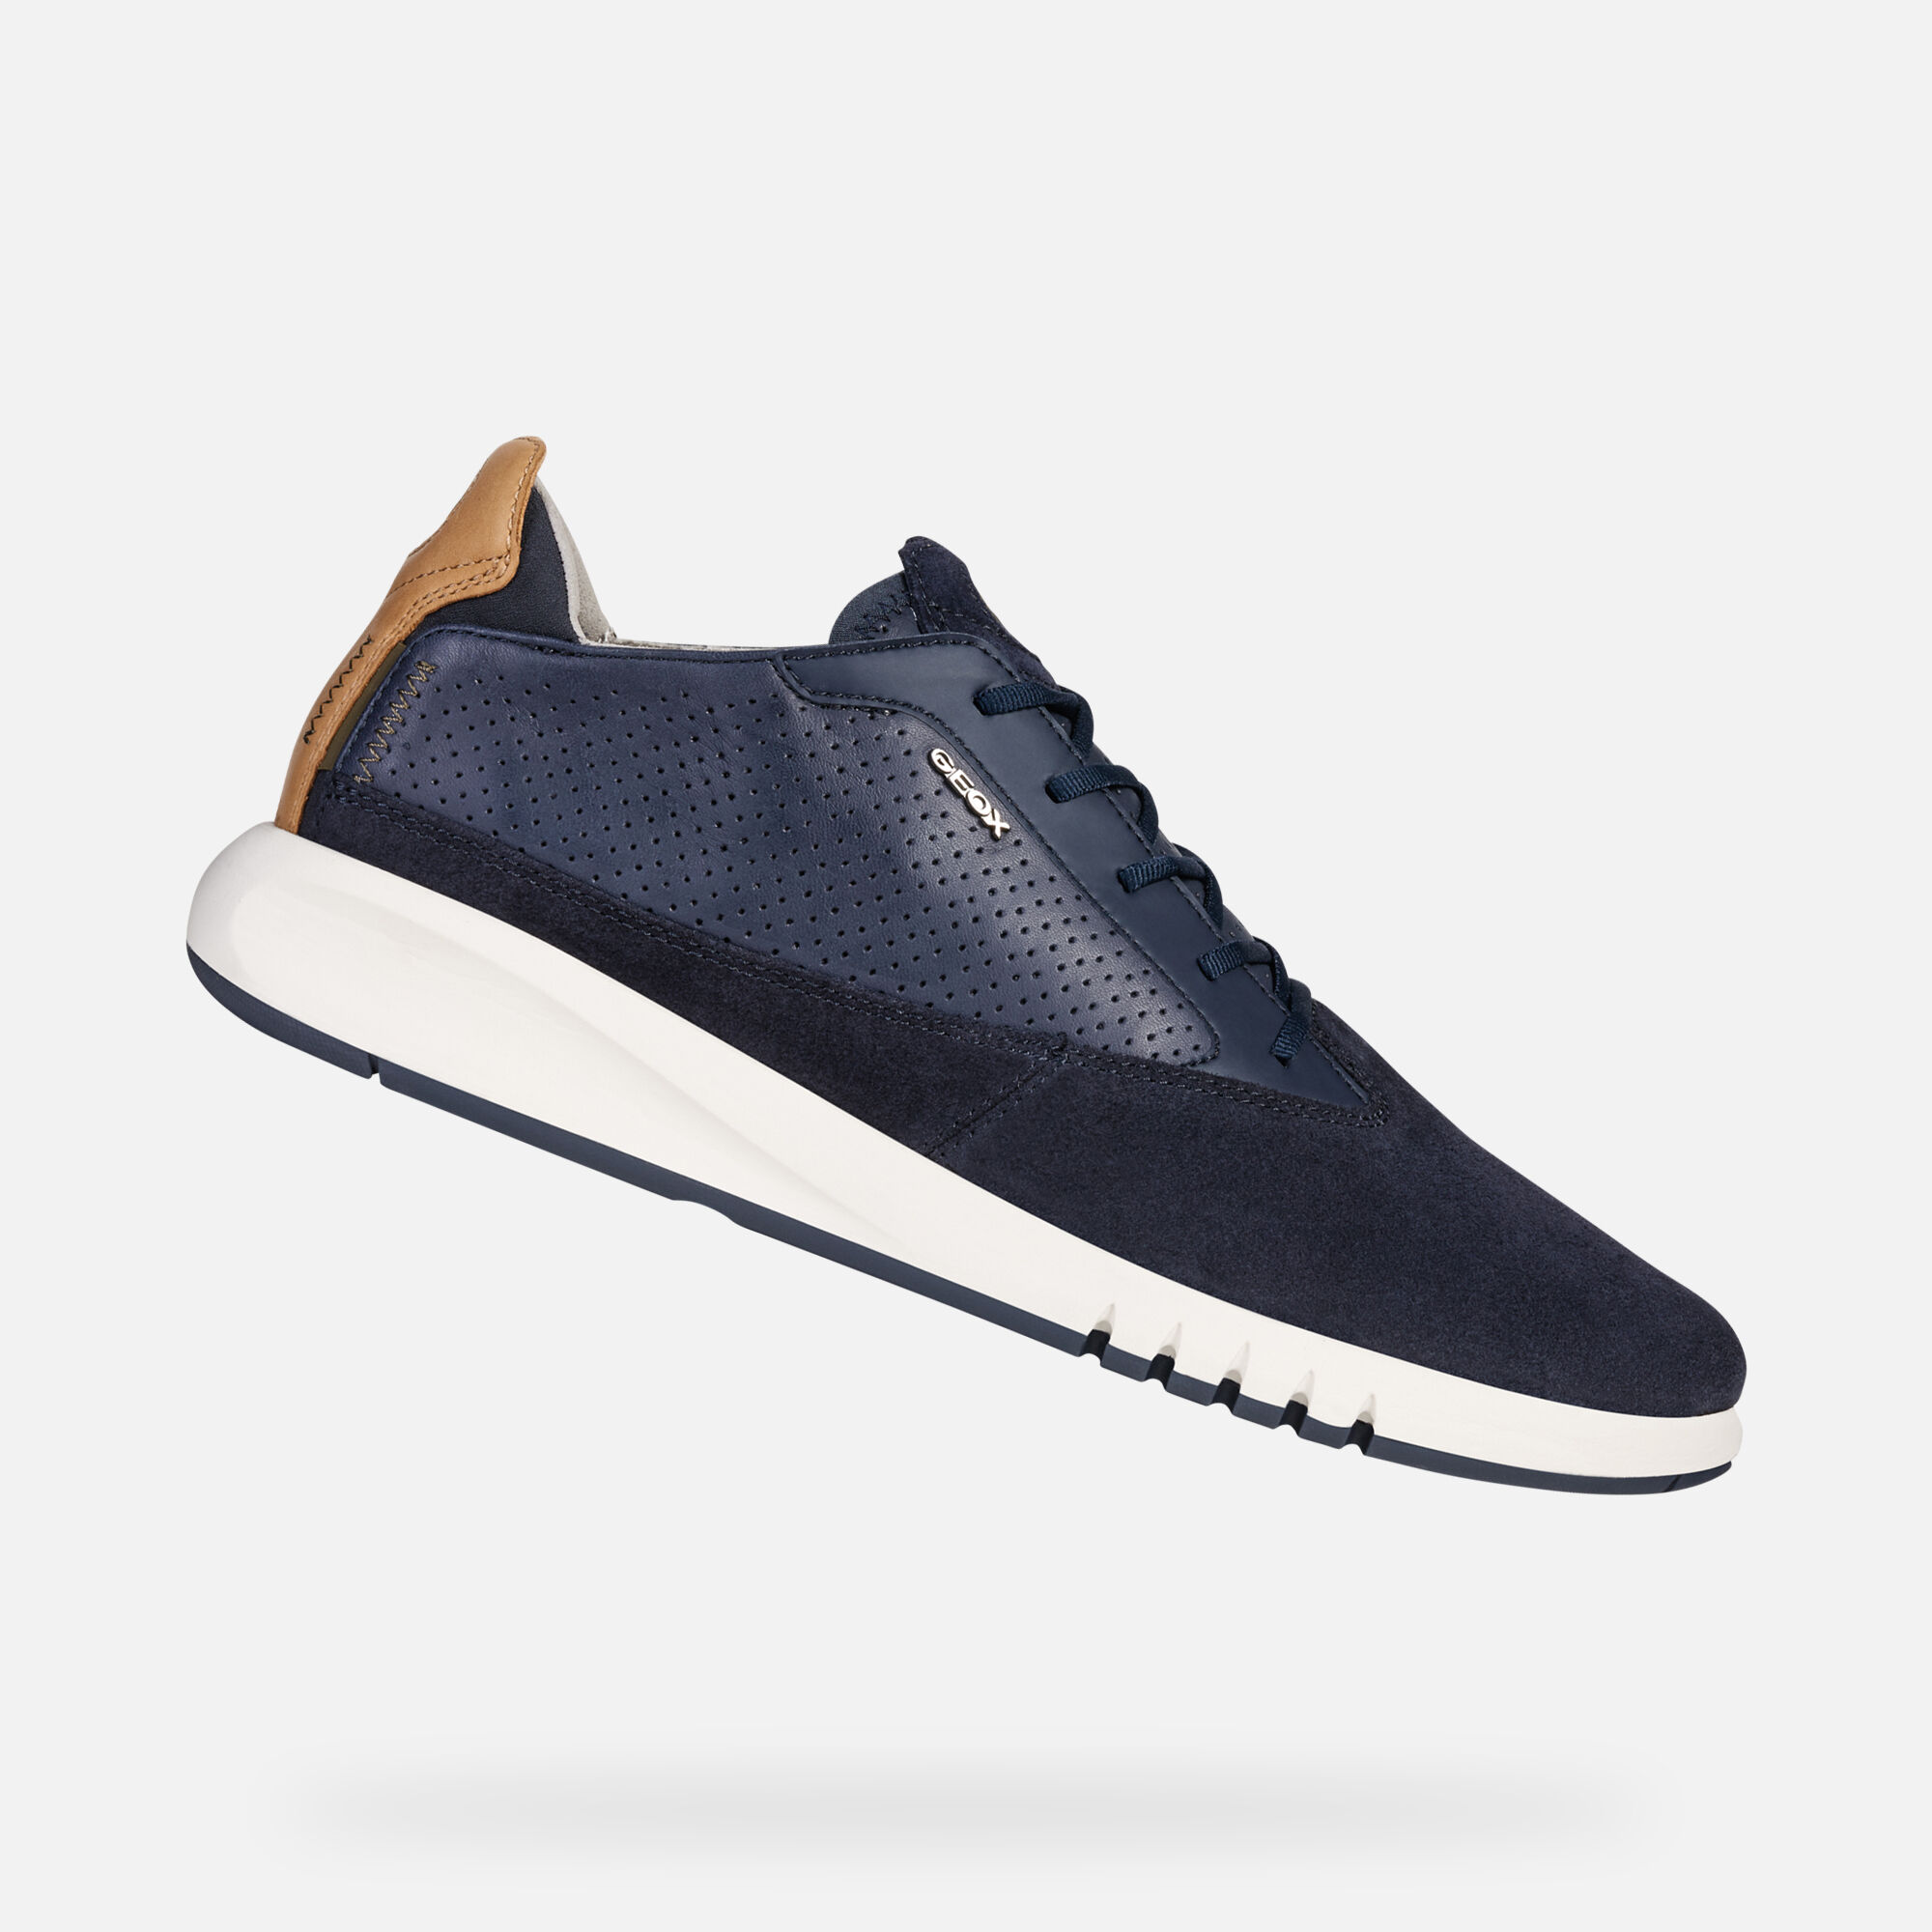 aerantis aerantis von herren geox  Neue Geox Navy Sneakers Herren Verkauf P 184 #13